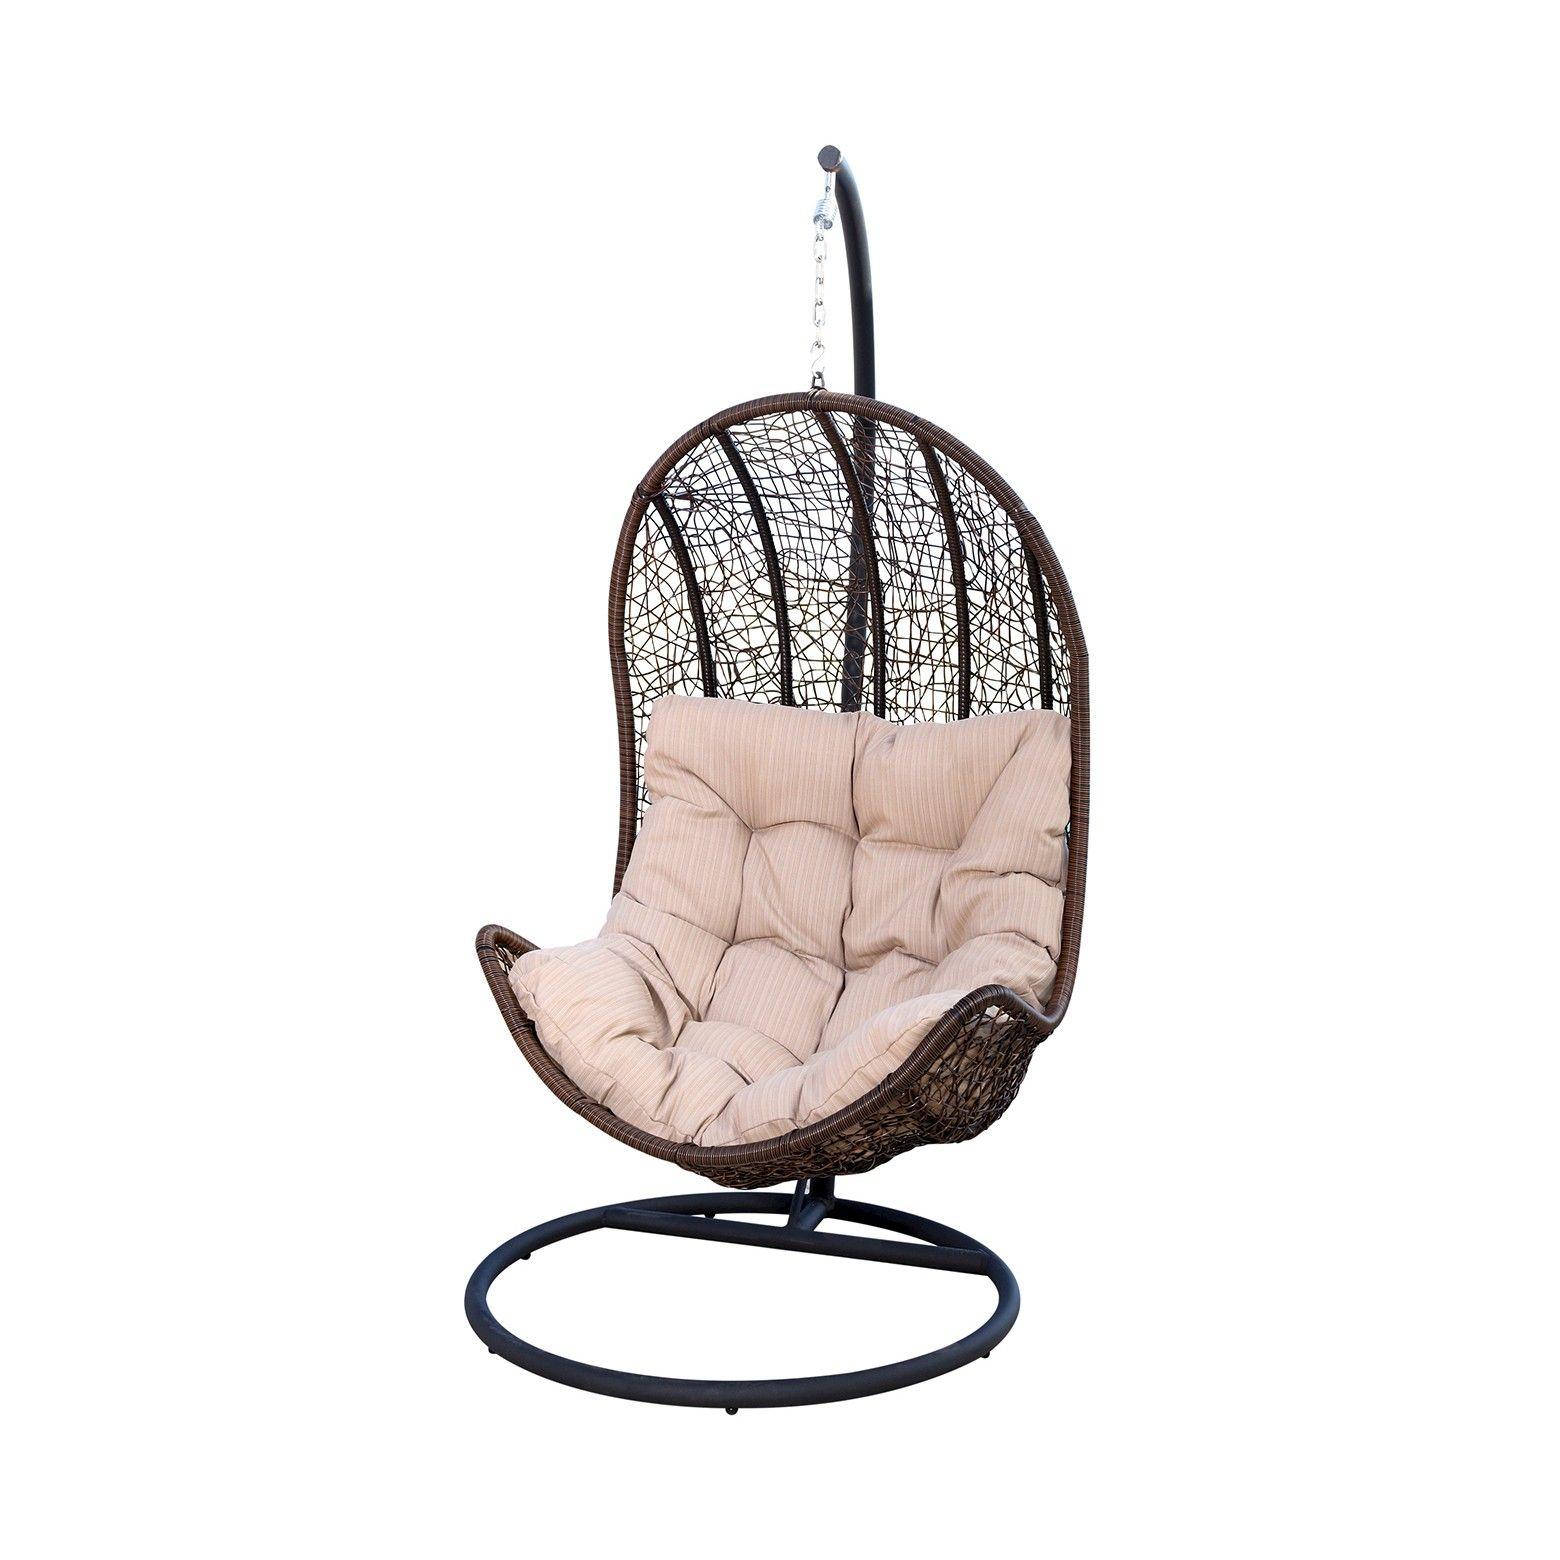 Newport Outdoor Wicker Egg Shaped Swing Chair Brown